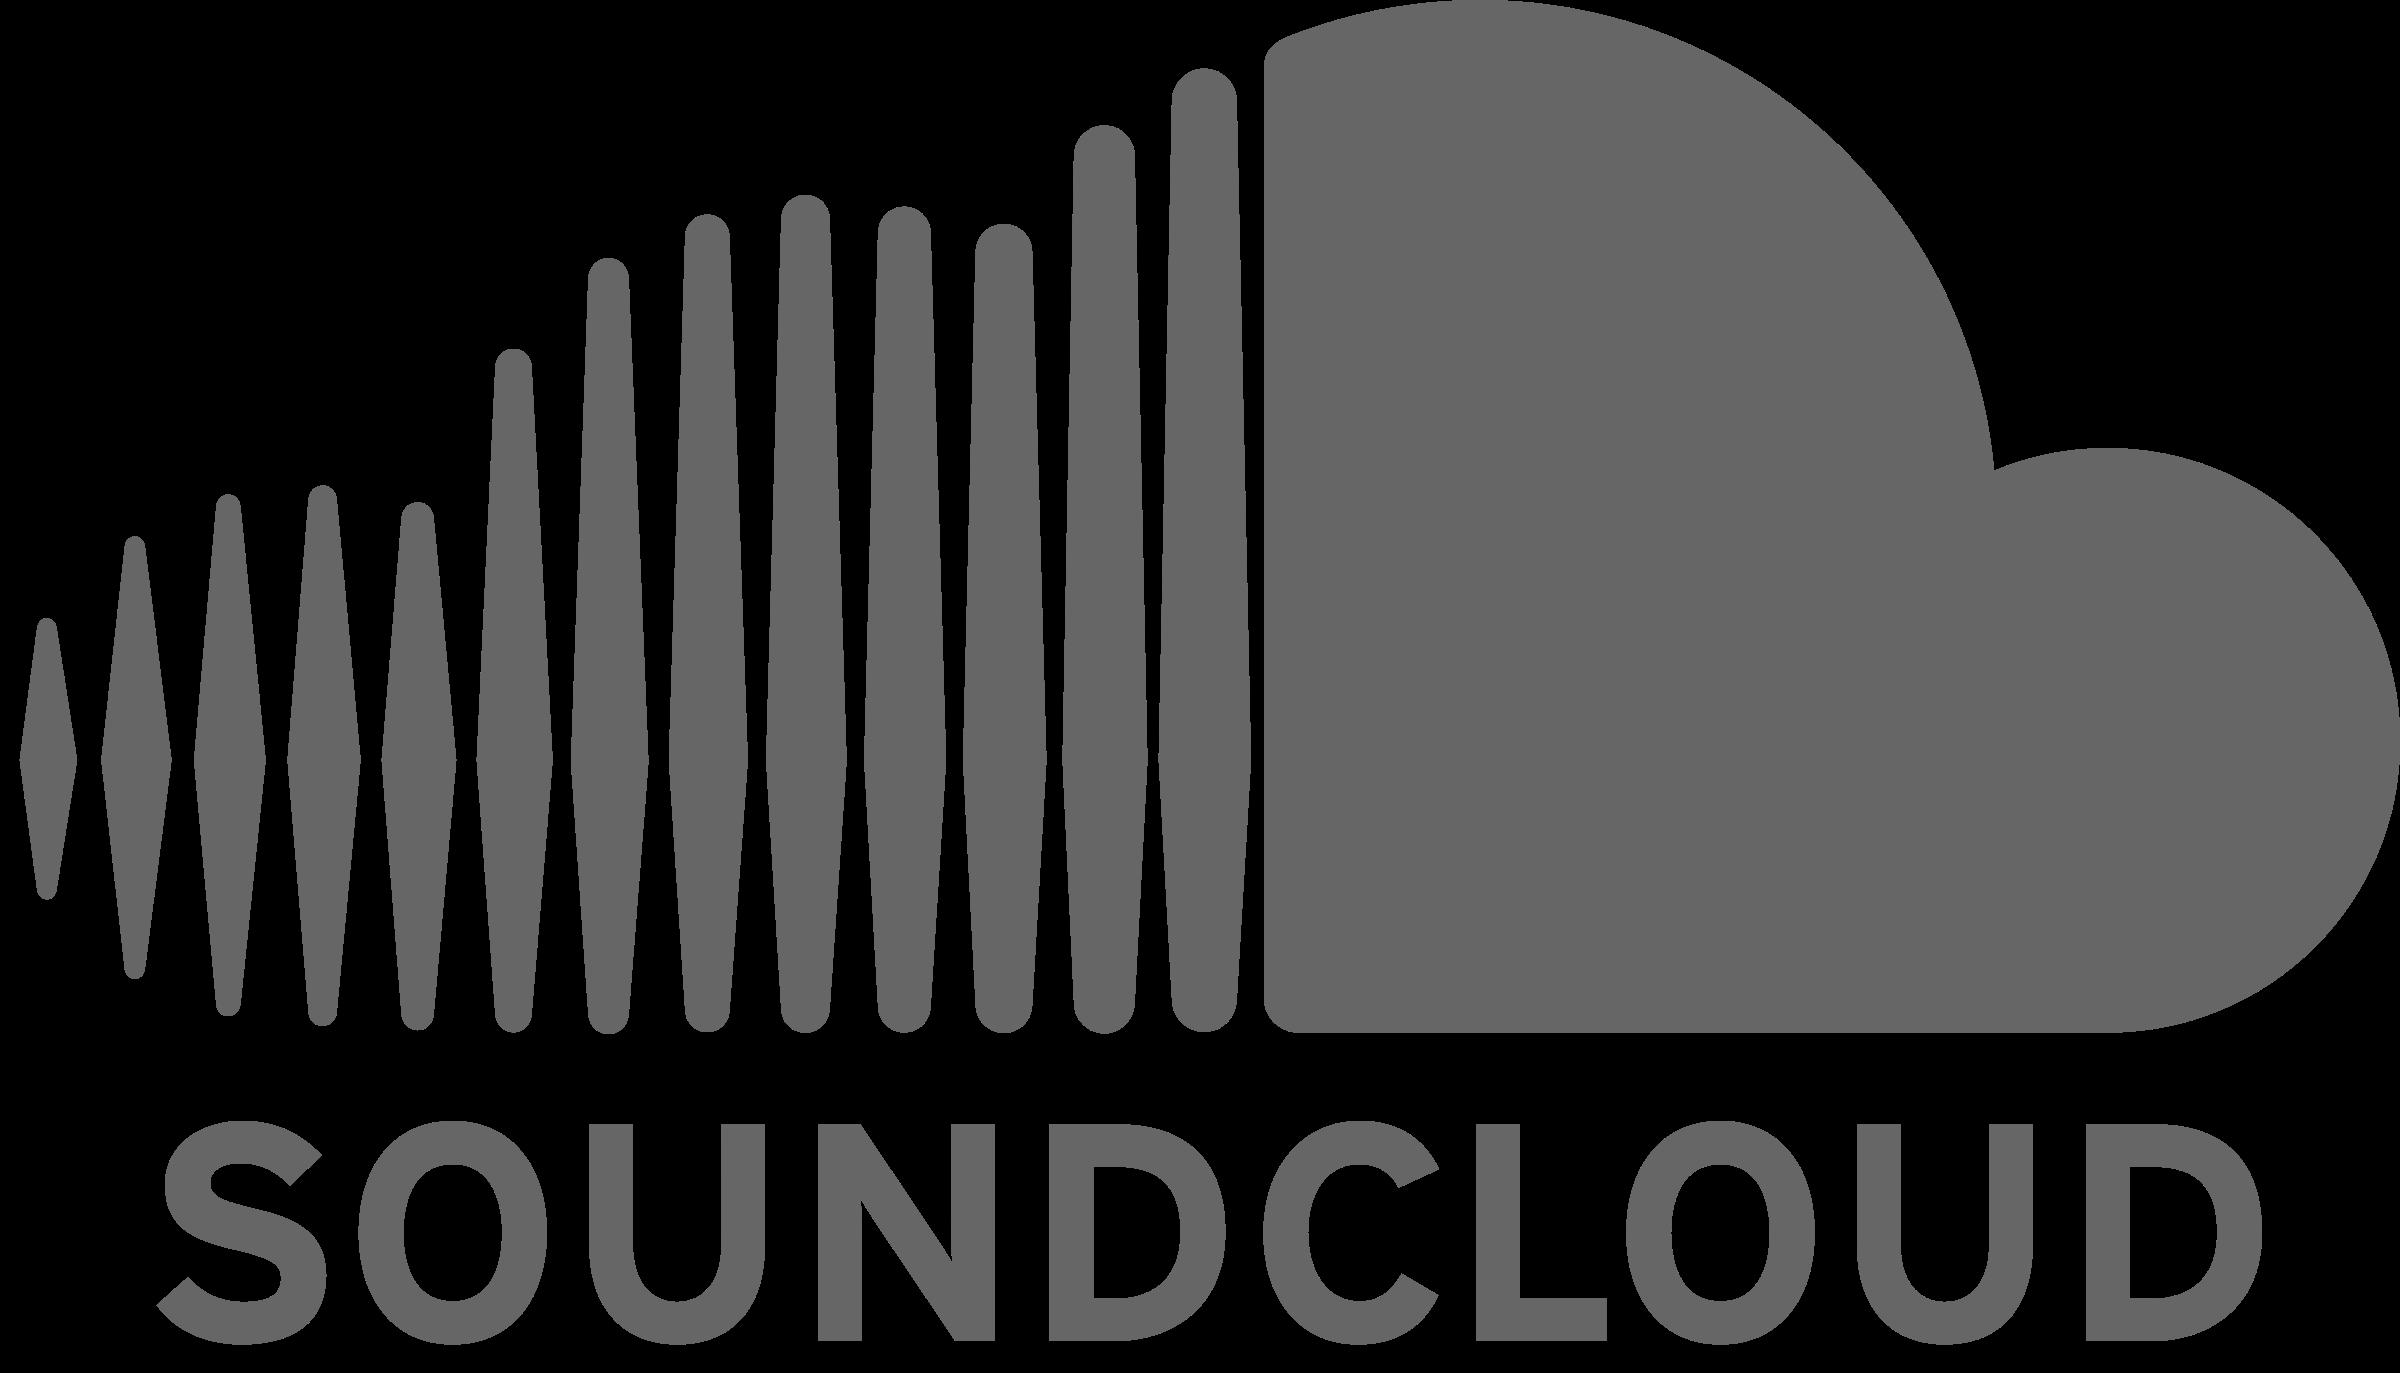 SoundCloud Logo PNG Transparent & SVG Vector - Freebie Supply